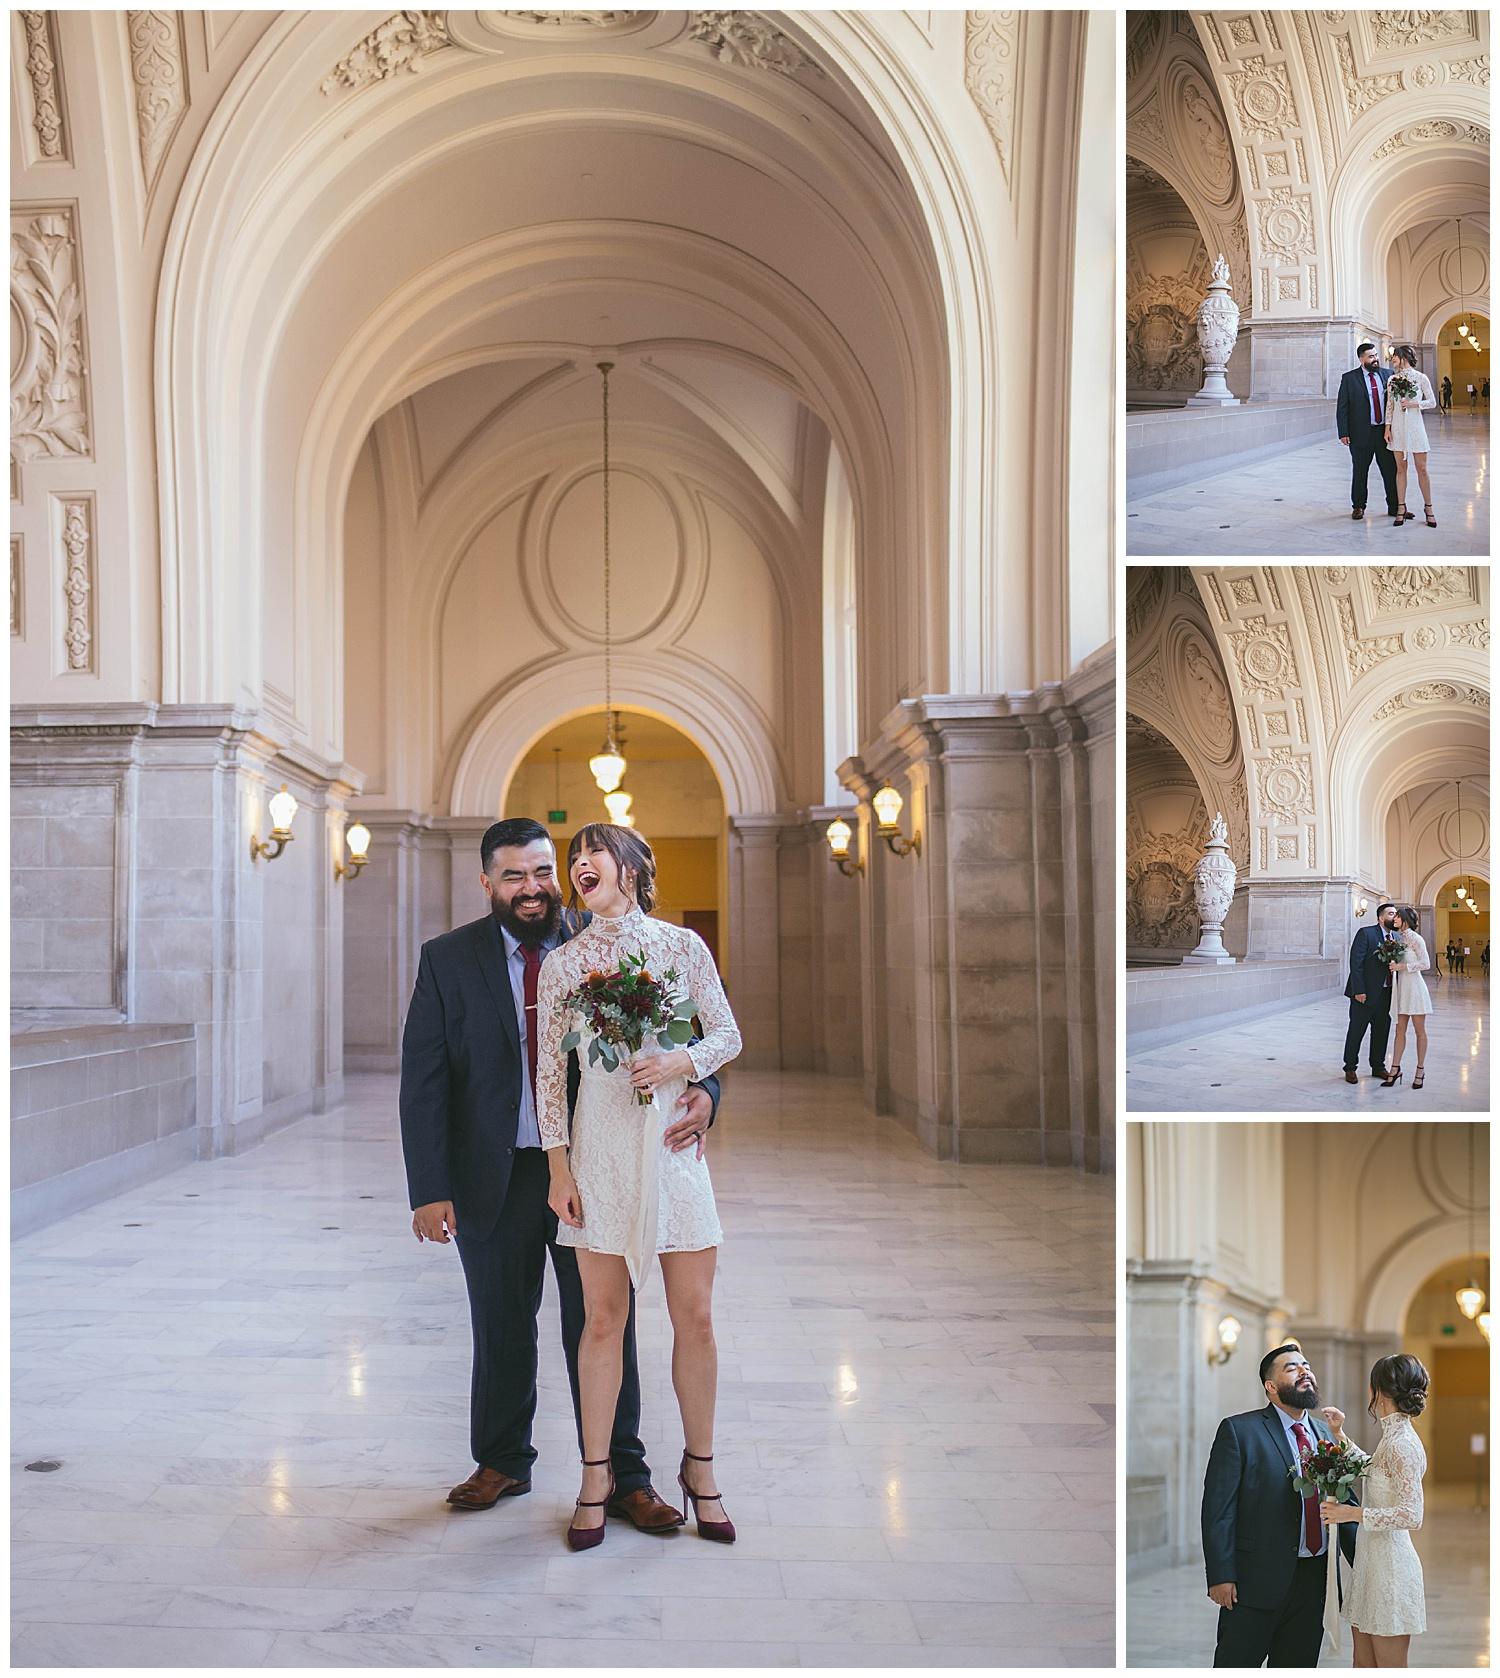 khariza-rae-photography-bay-area-wedding-photographer_0057.jpg